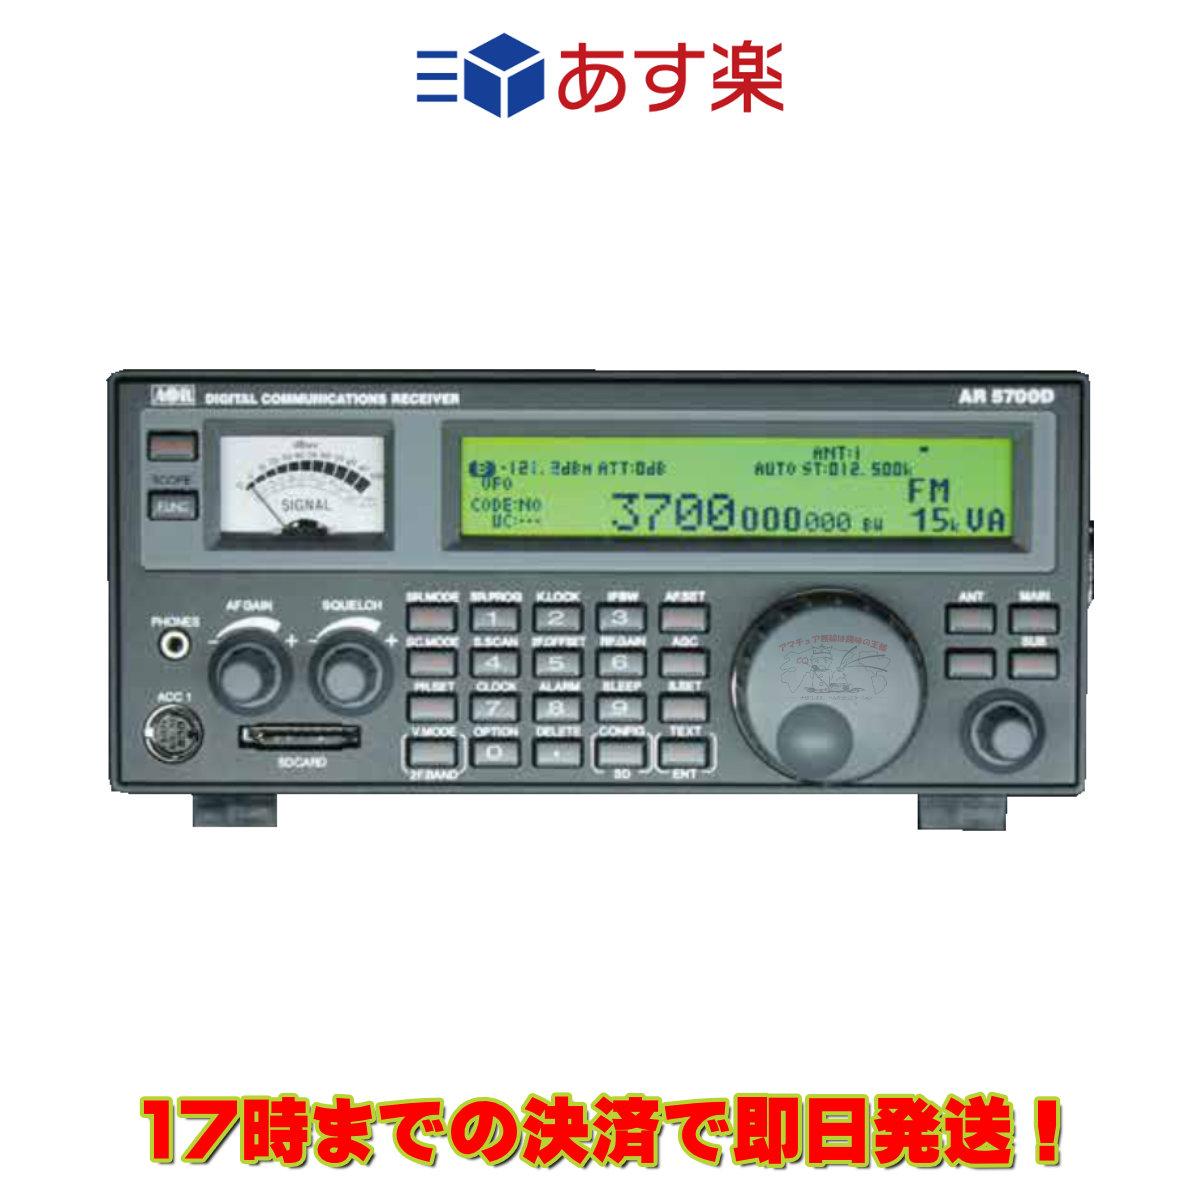 AR5700D エーオーアール デジタルコミュニケーションレシーバー